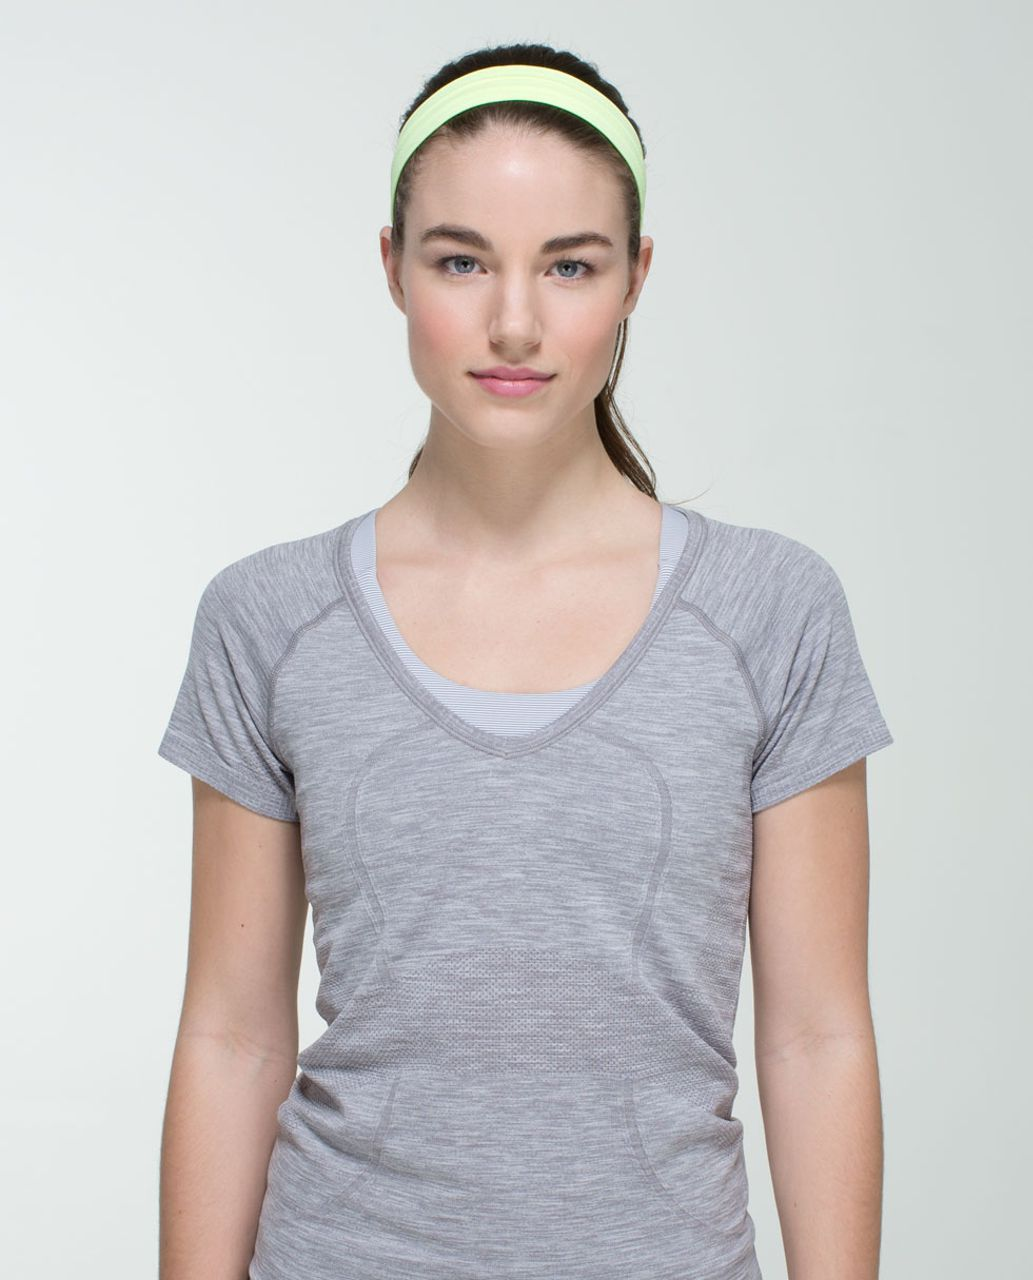 Lululemon Swiftly Headband - Heathered Clear Mint